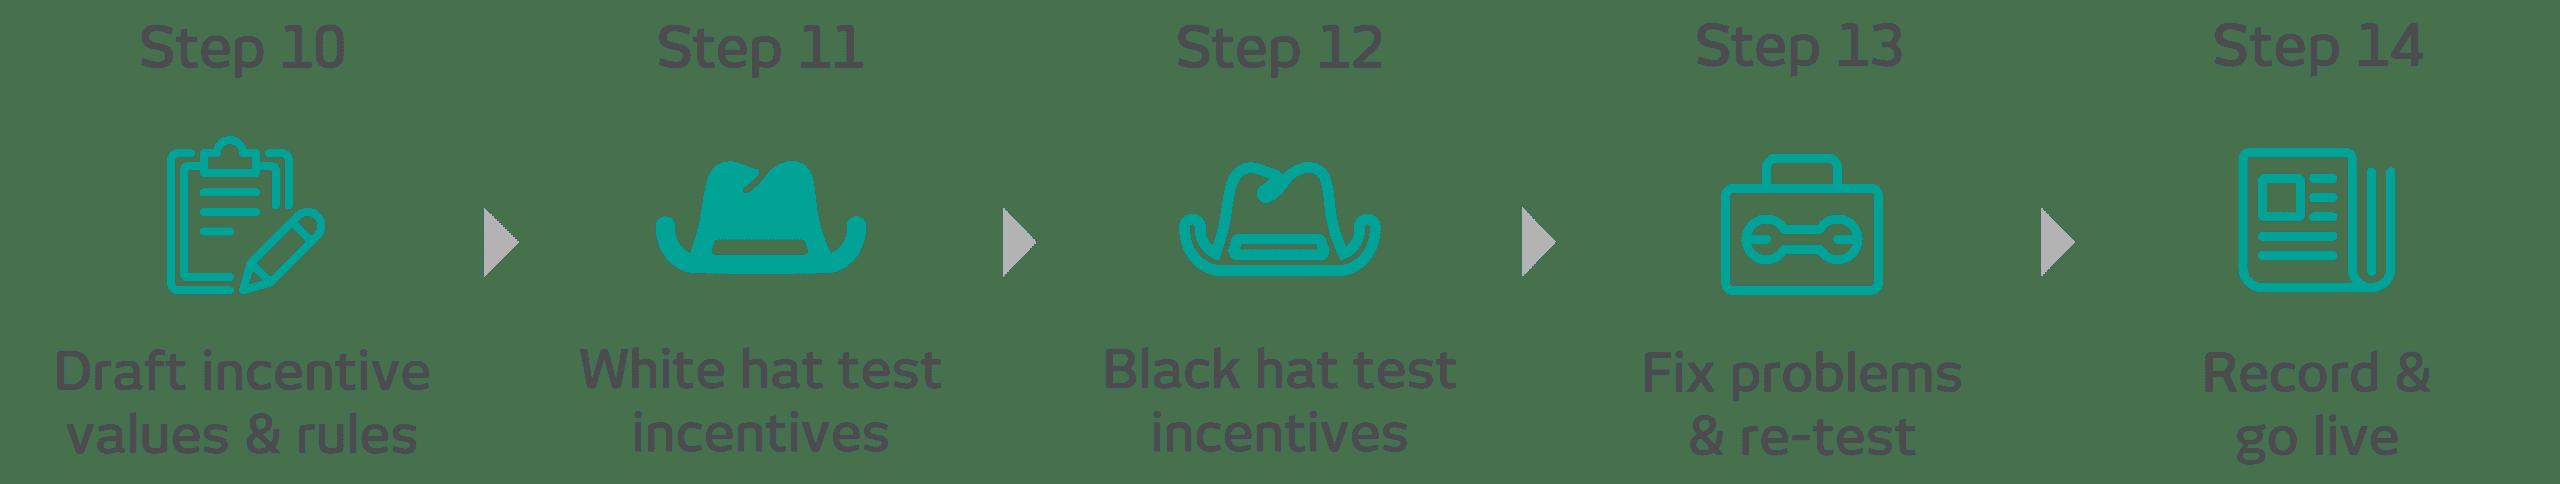 ROKET-DS Incentive Process - no heading@4x